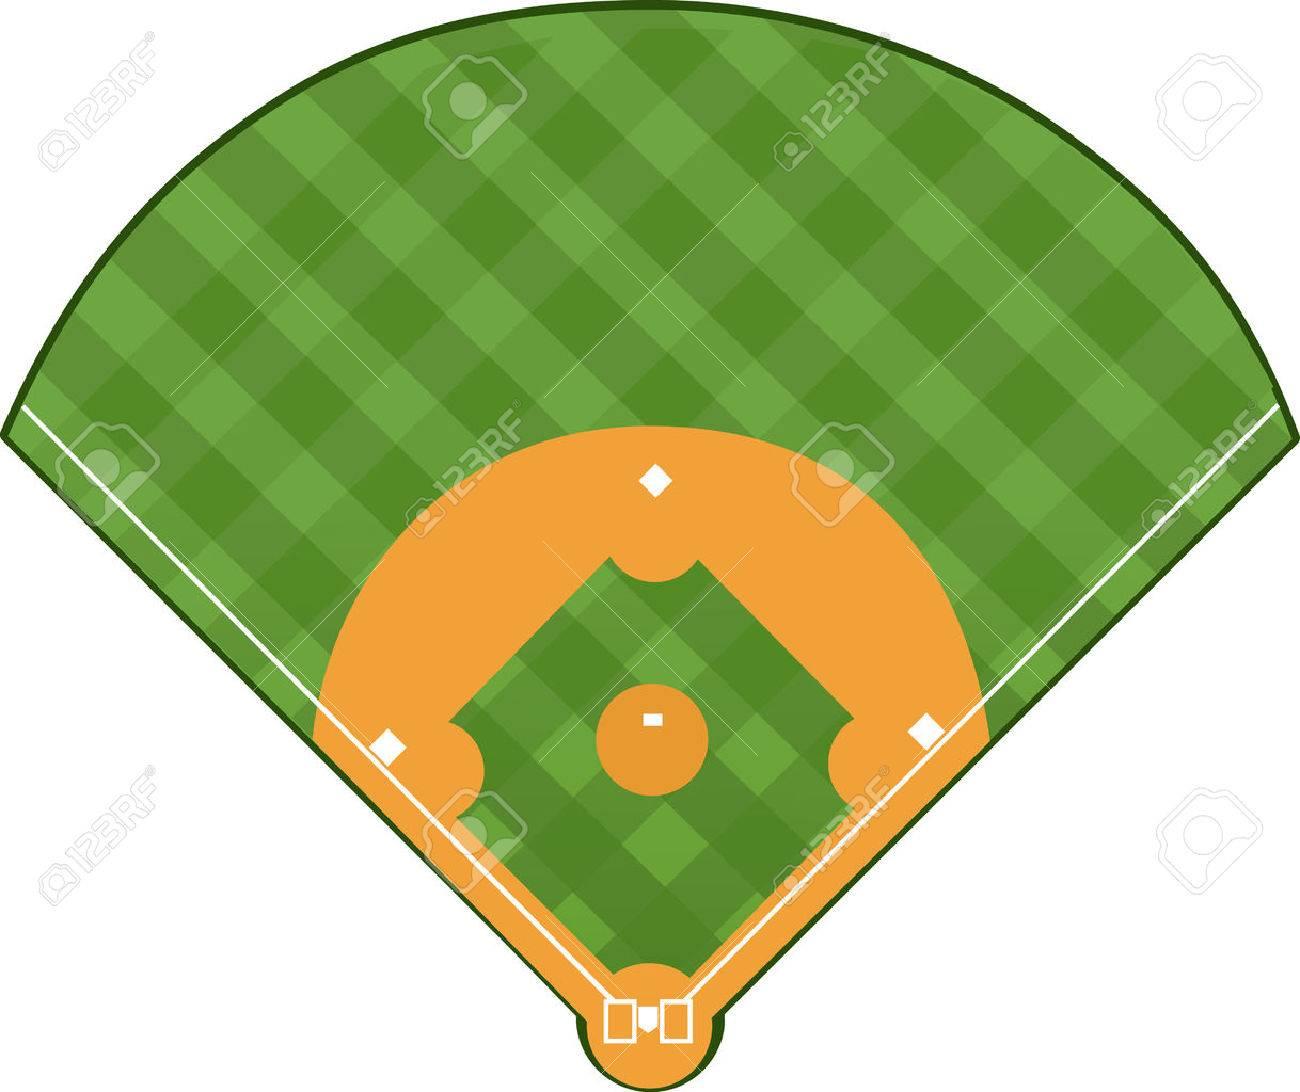 baseball field royalty free cliparts vectors and stock rh 123rf com baseball field vector image baseball field diagram vector